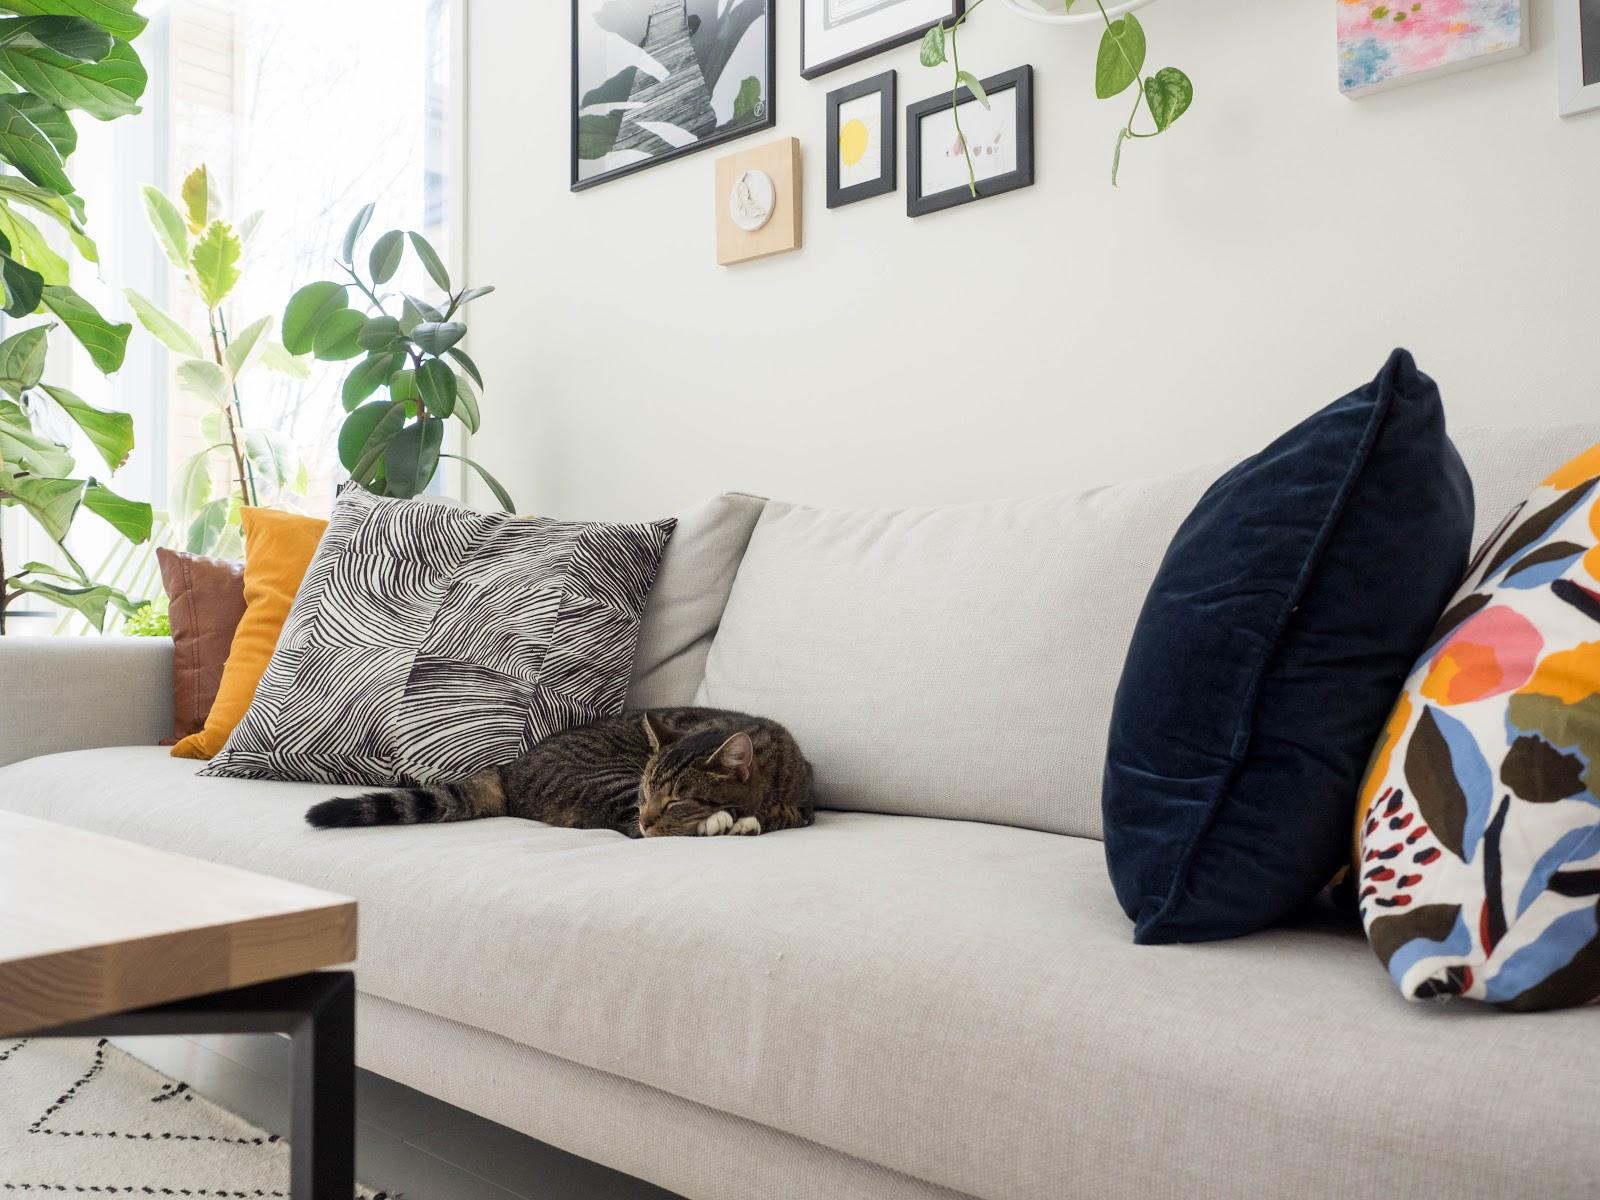 kissa sohvalla, olohuone, sisustus